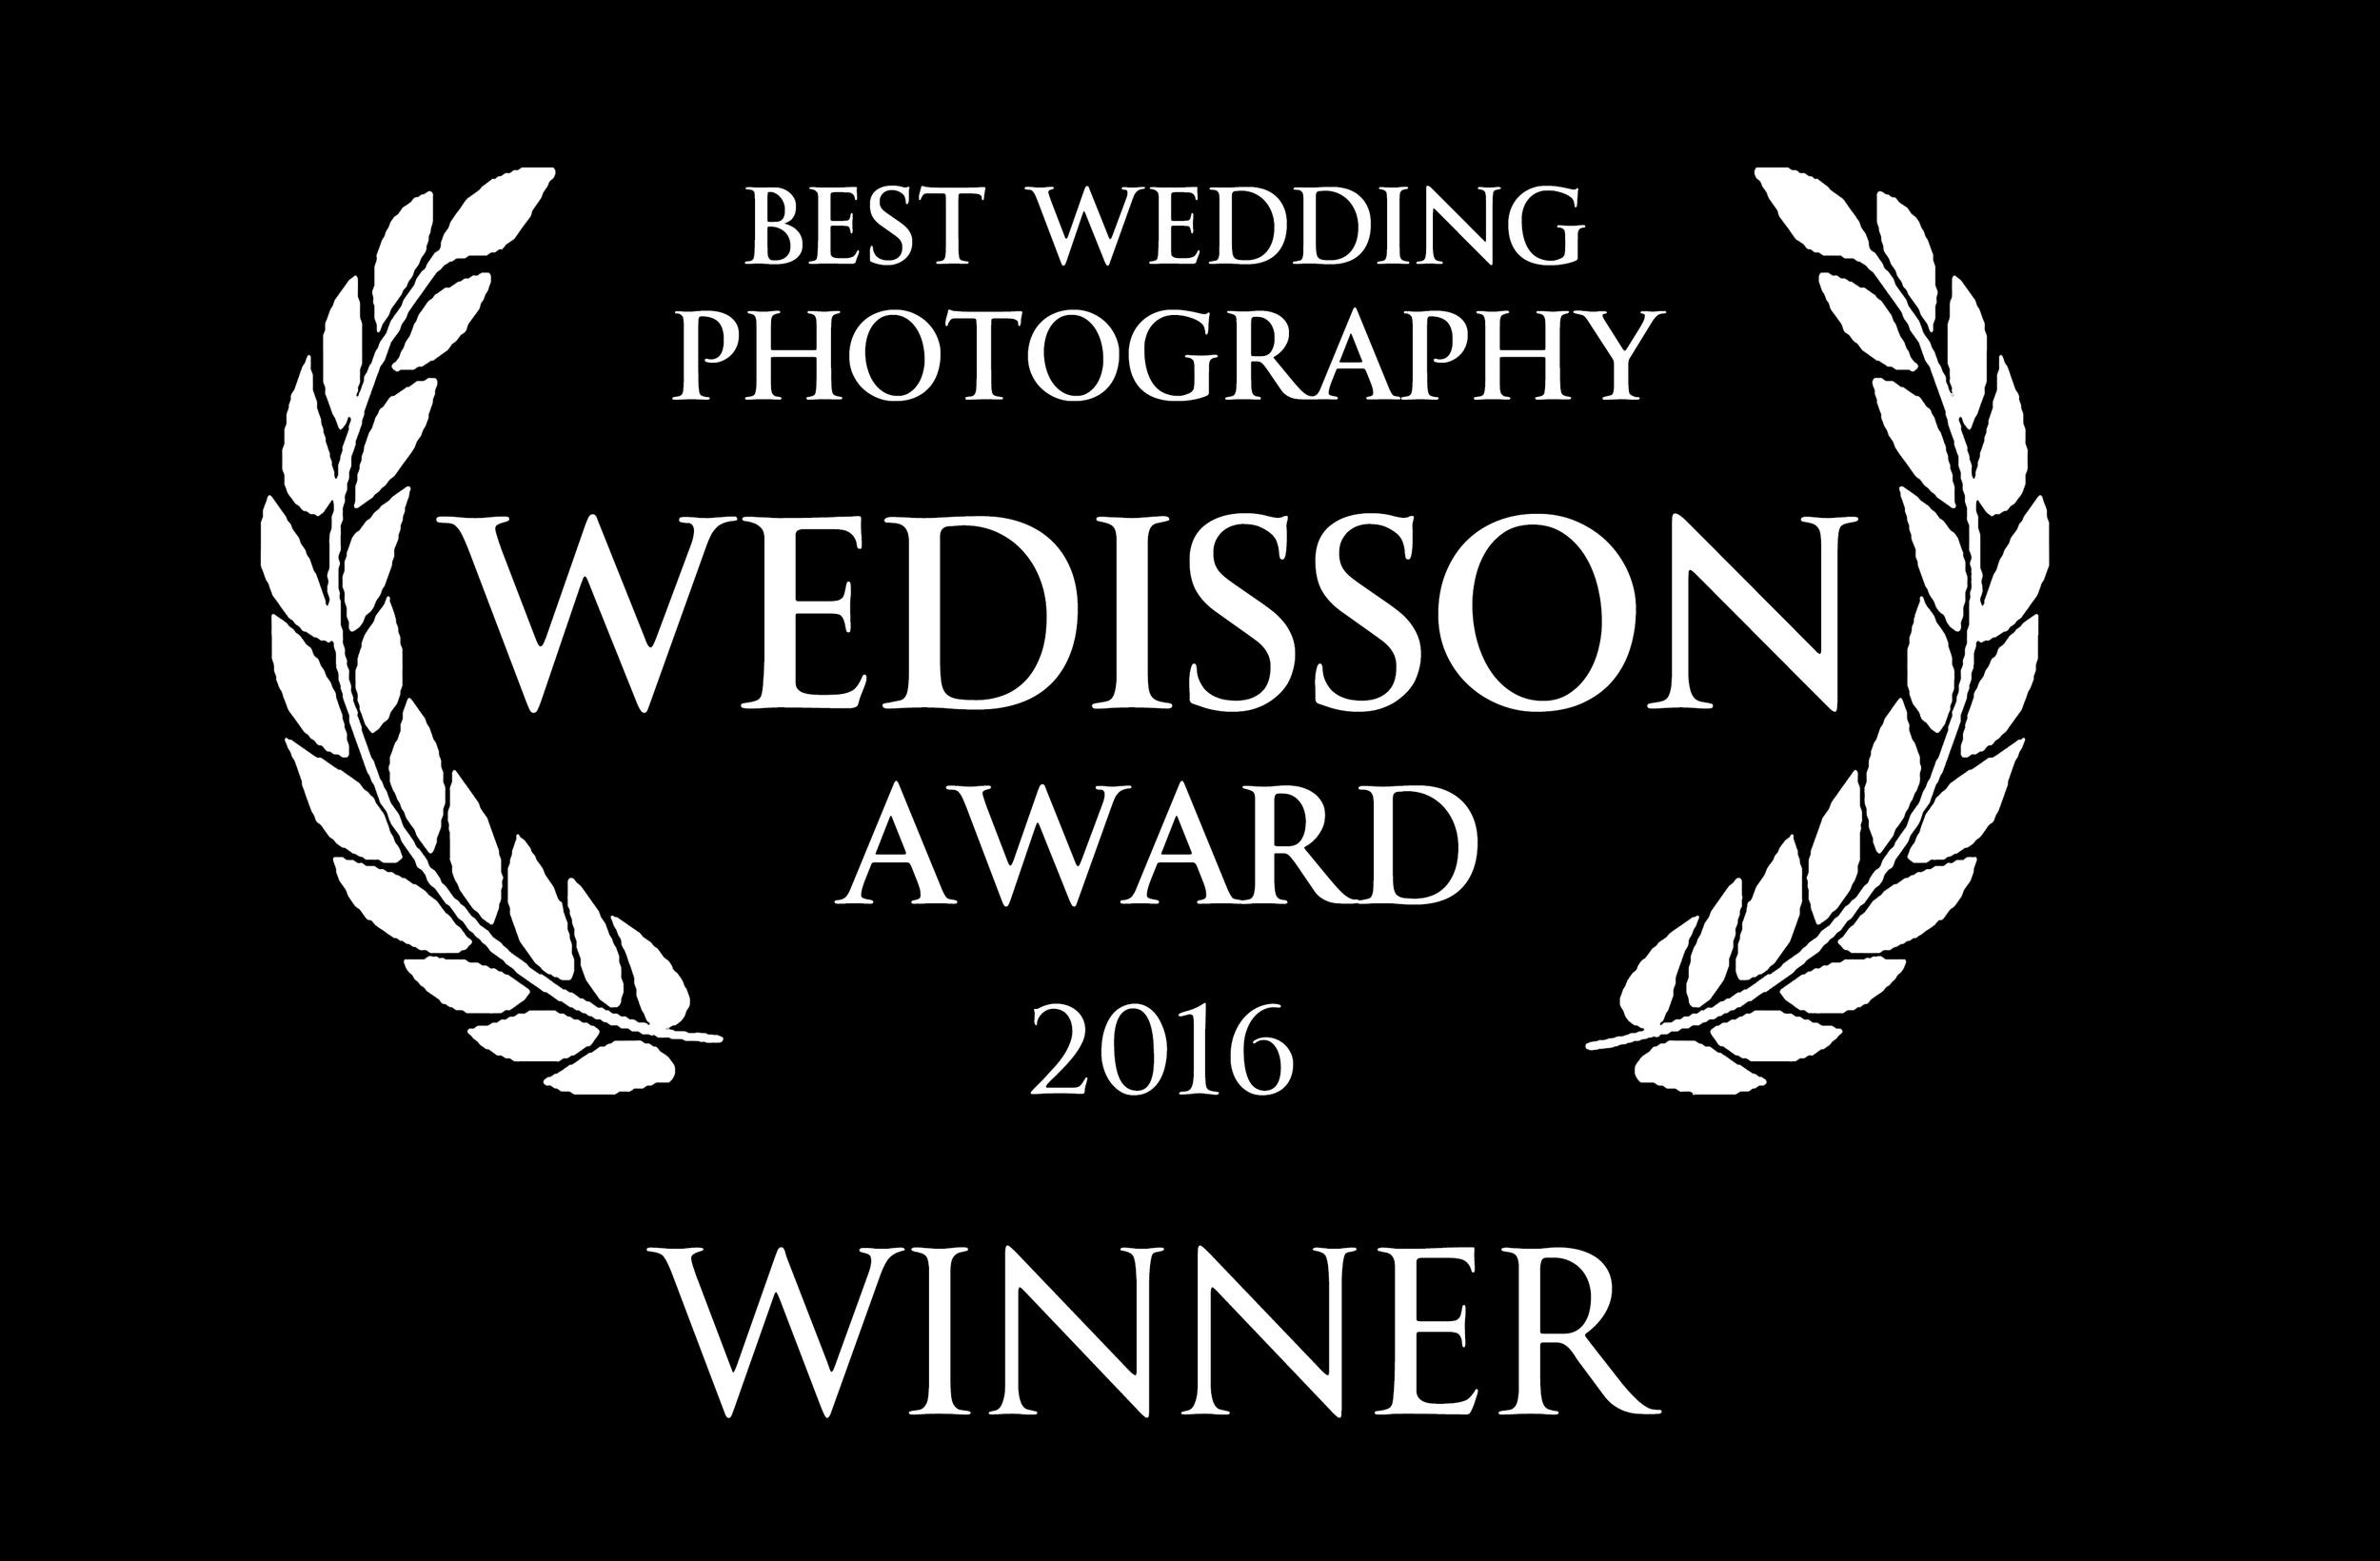 Wedisson logo black bg.jpg